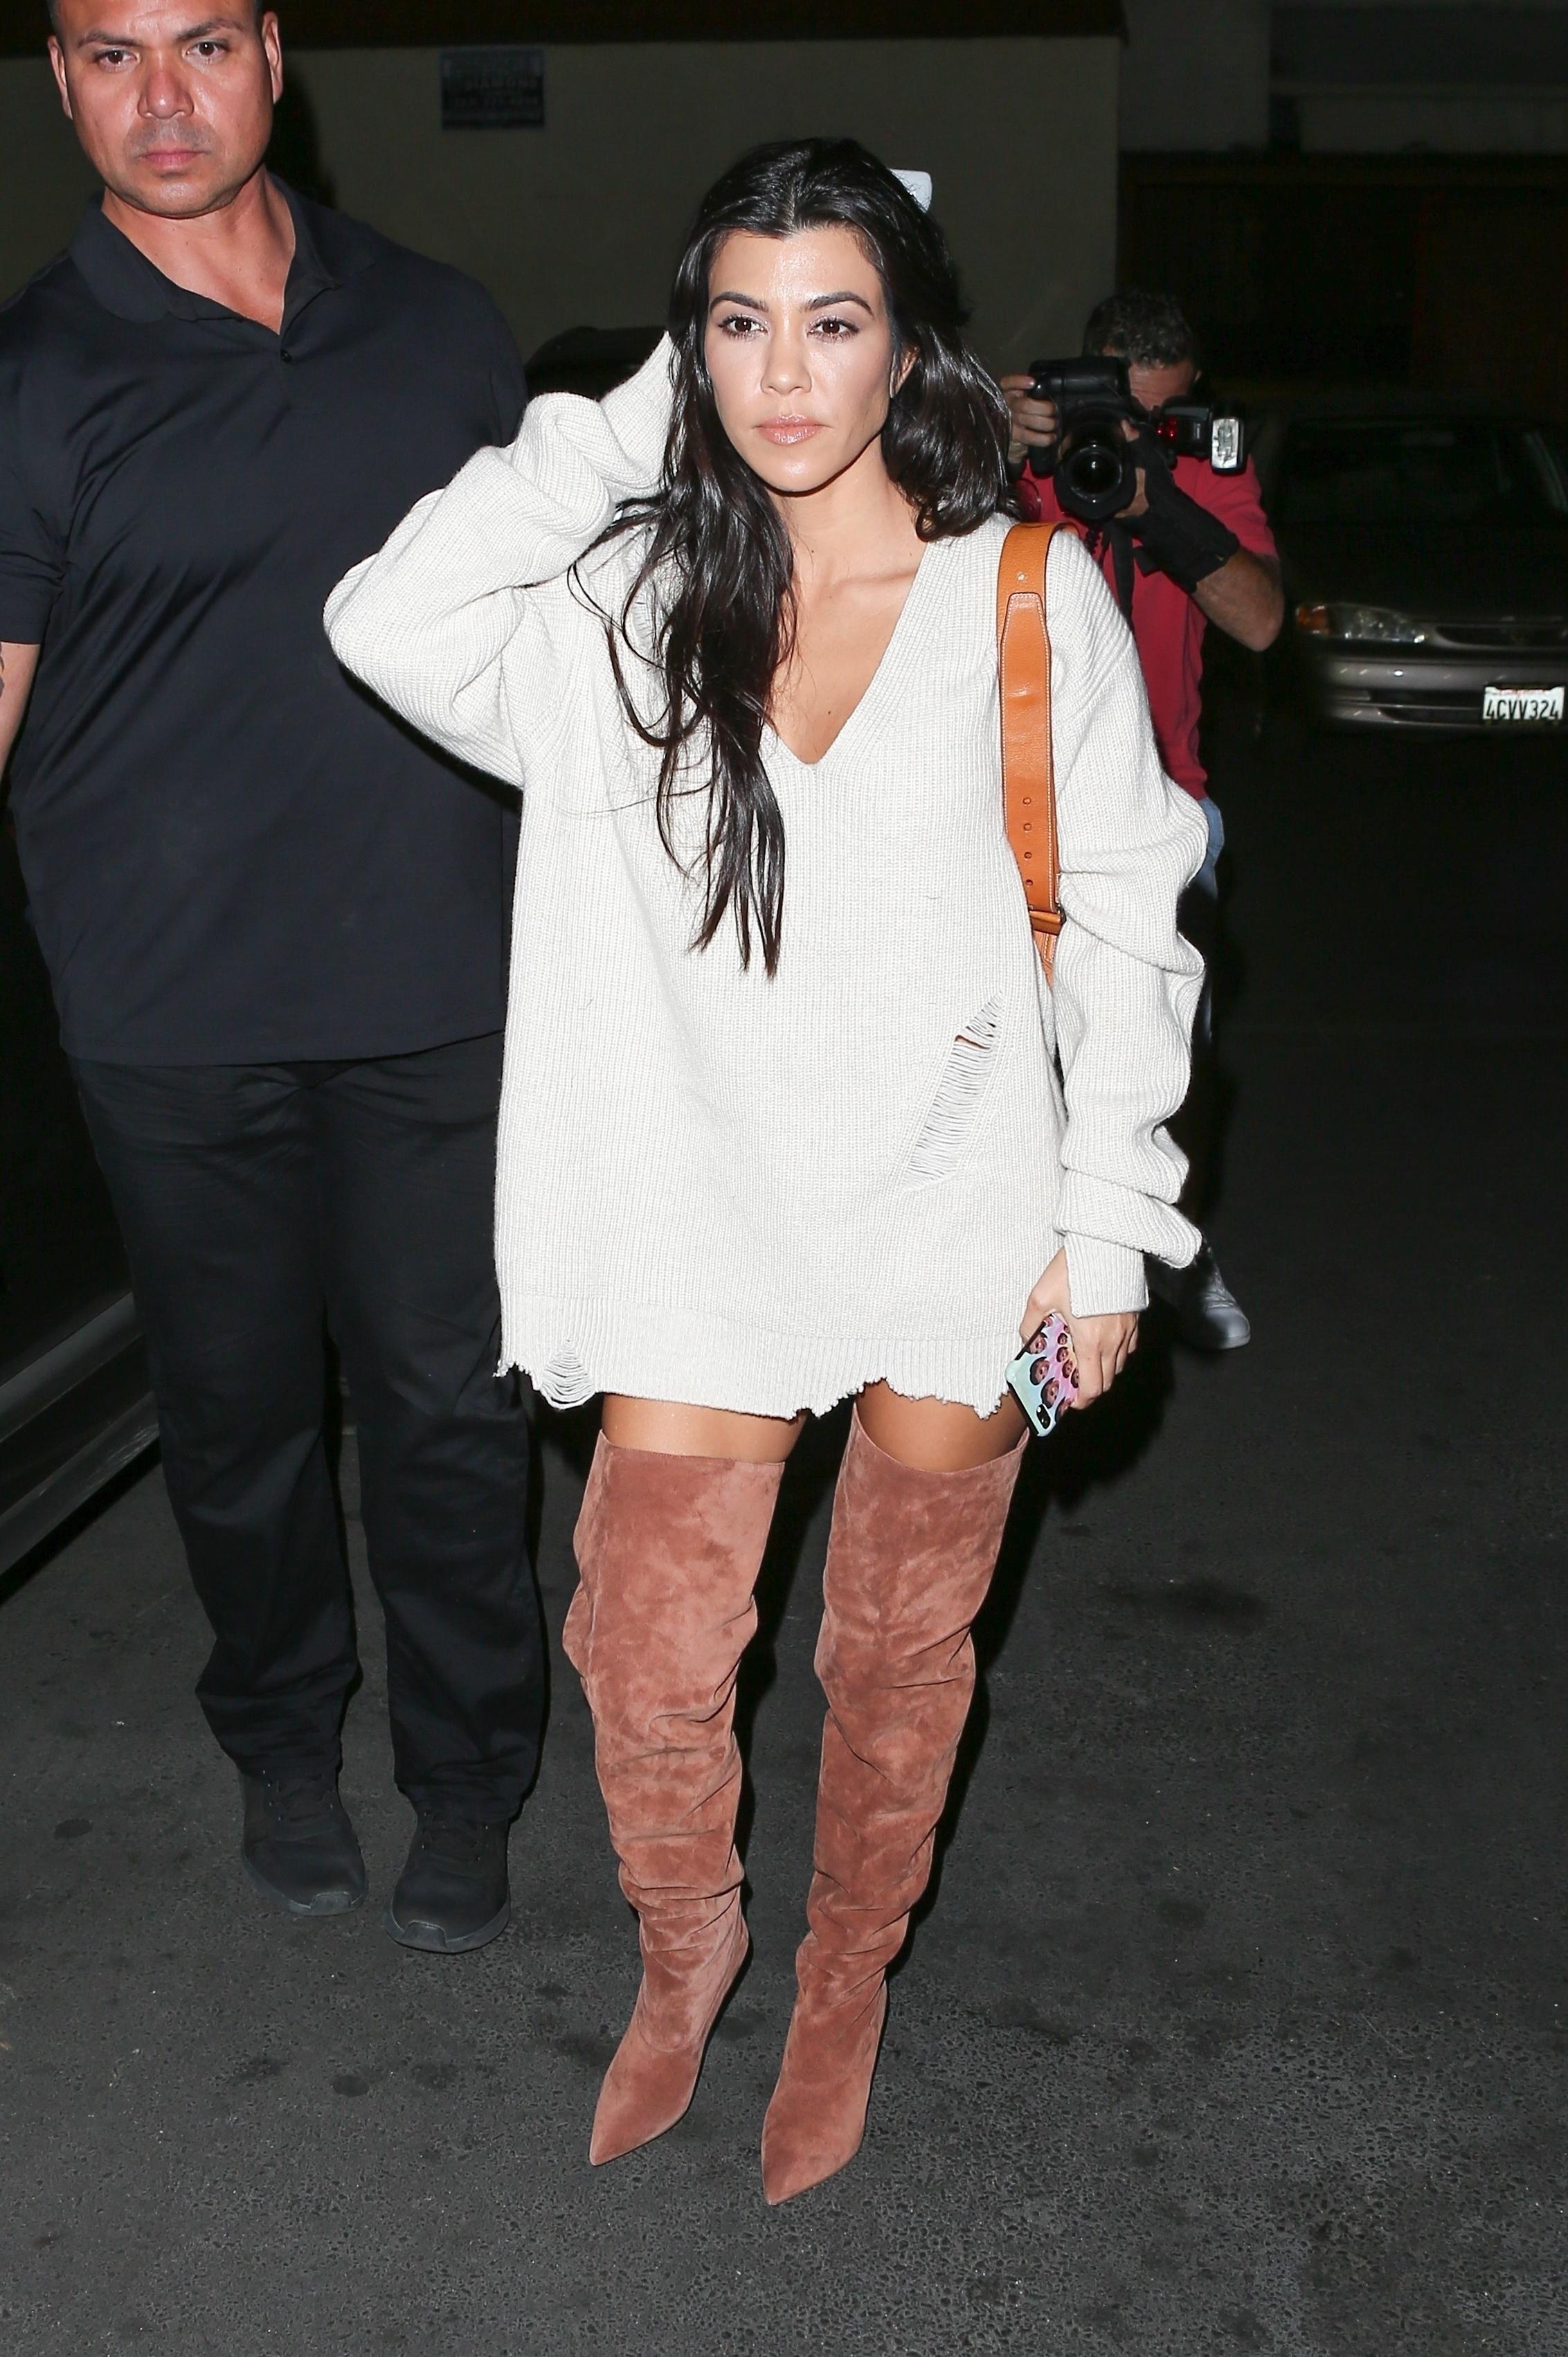 The Kardashian celebrates Kim's birthday at Carousel Restaurant in LA